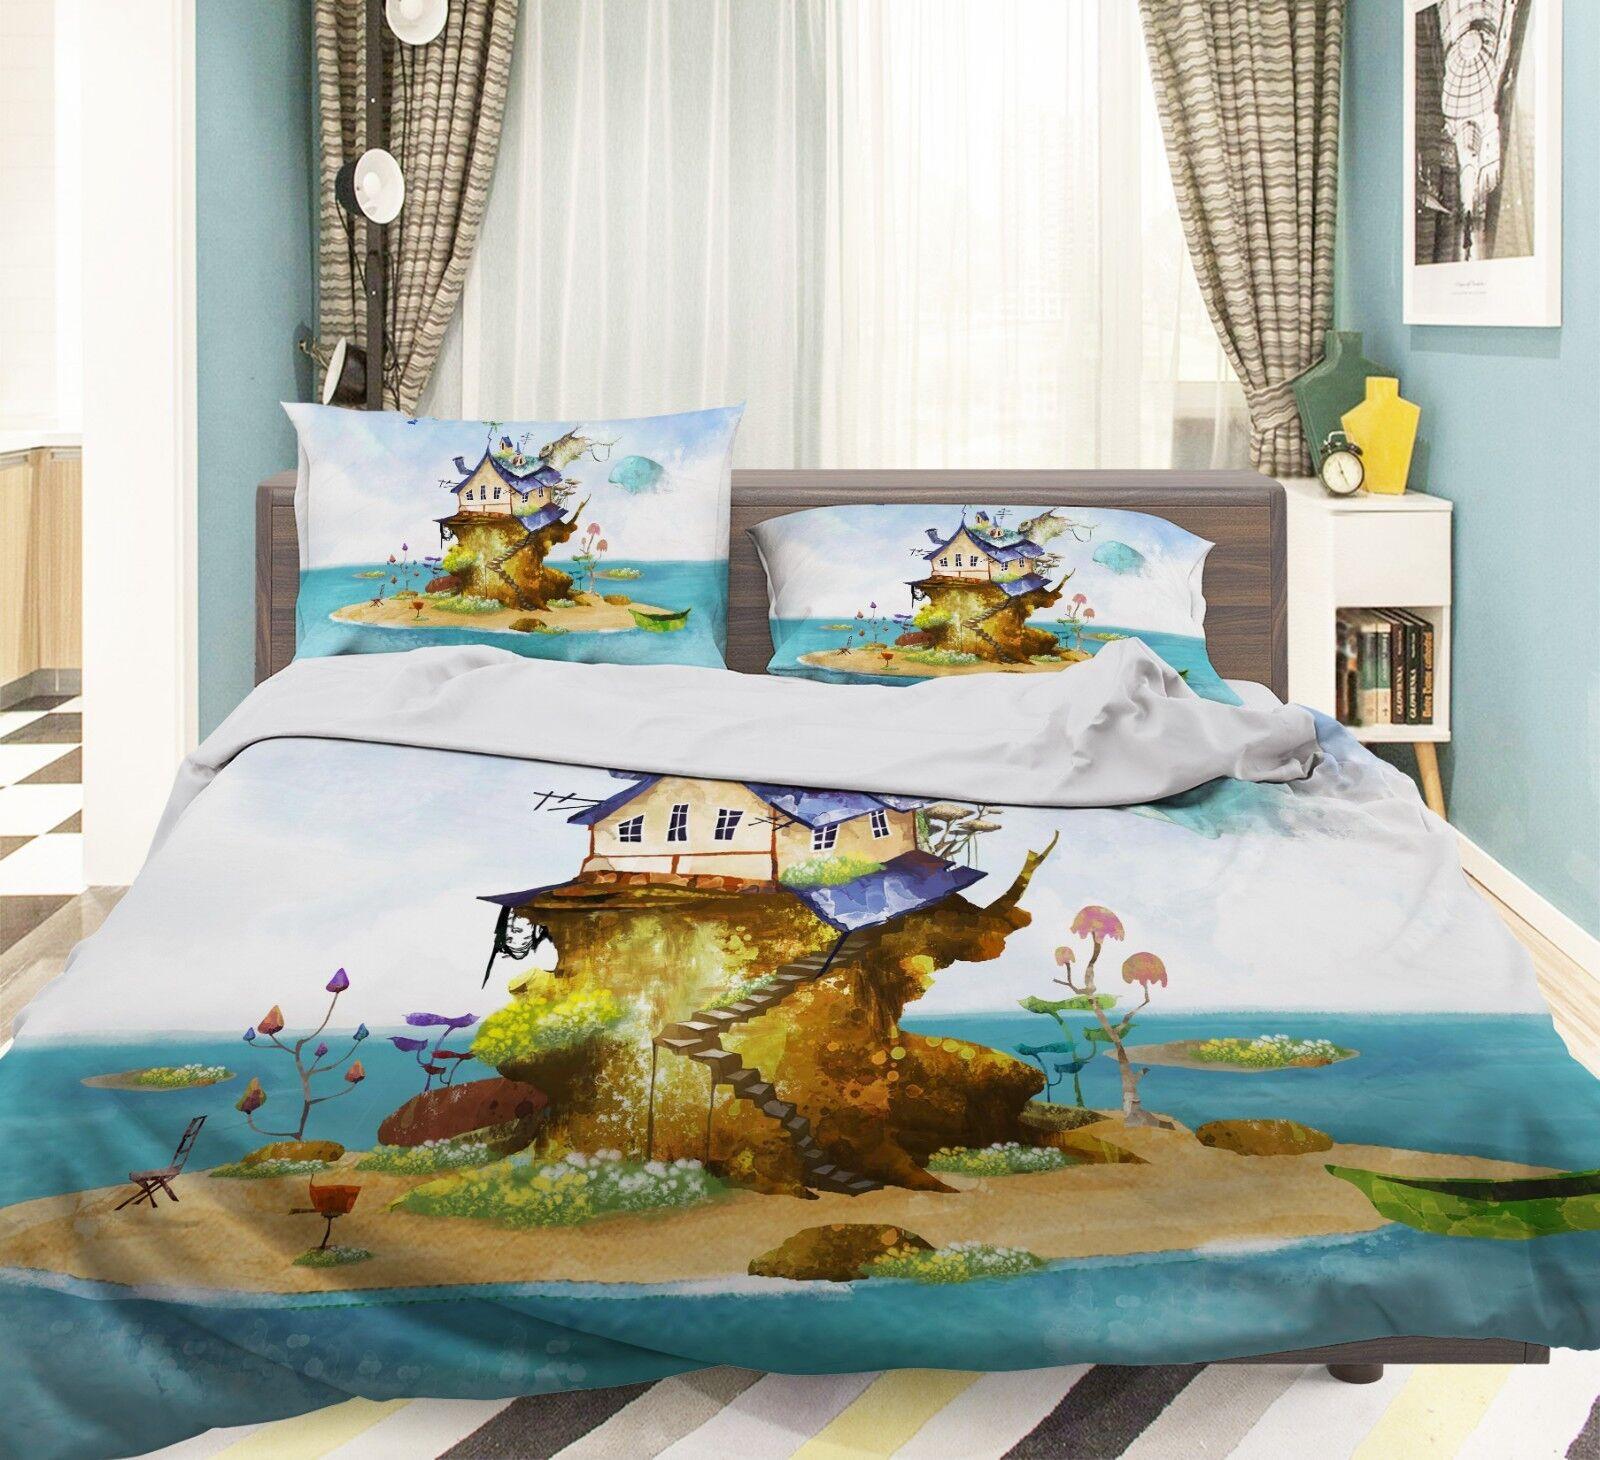 Isola 3d casa letto 304 federe steppe duvet set soffitto single regina de